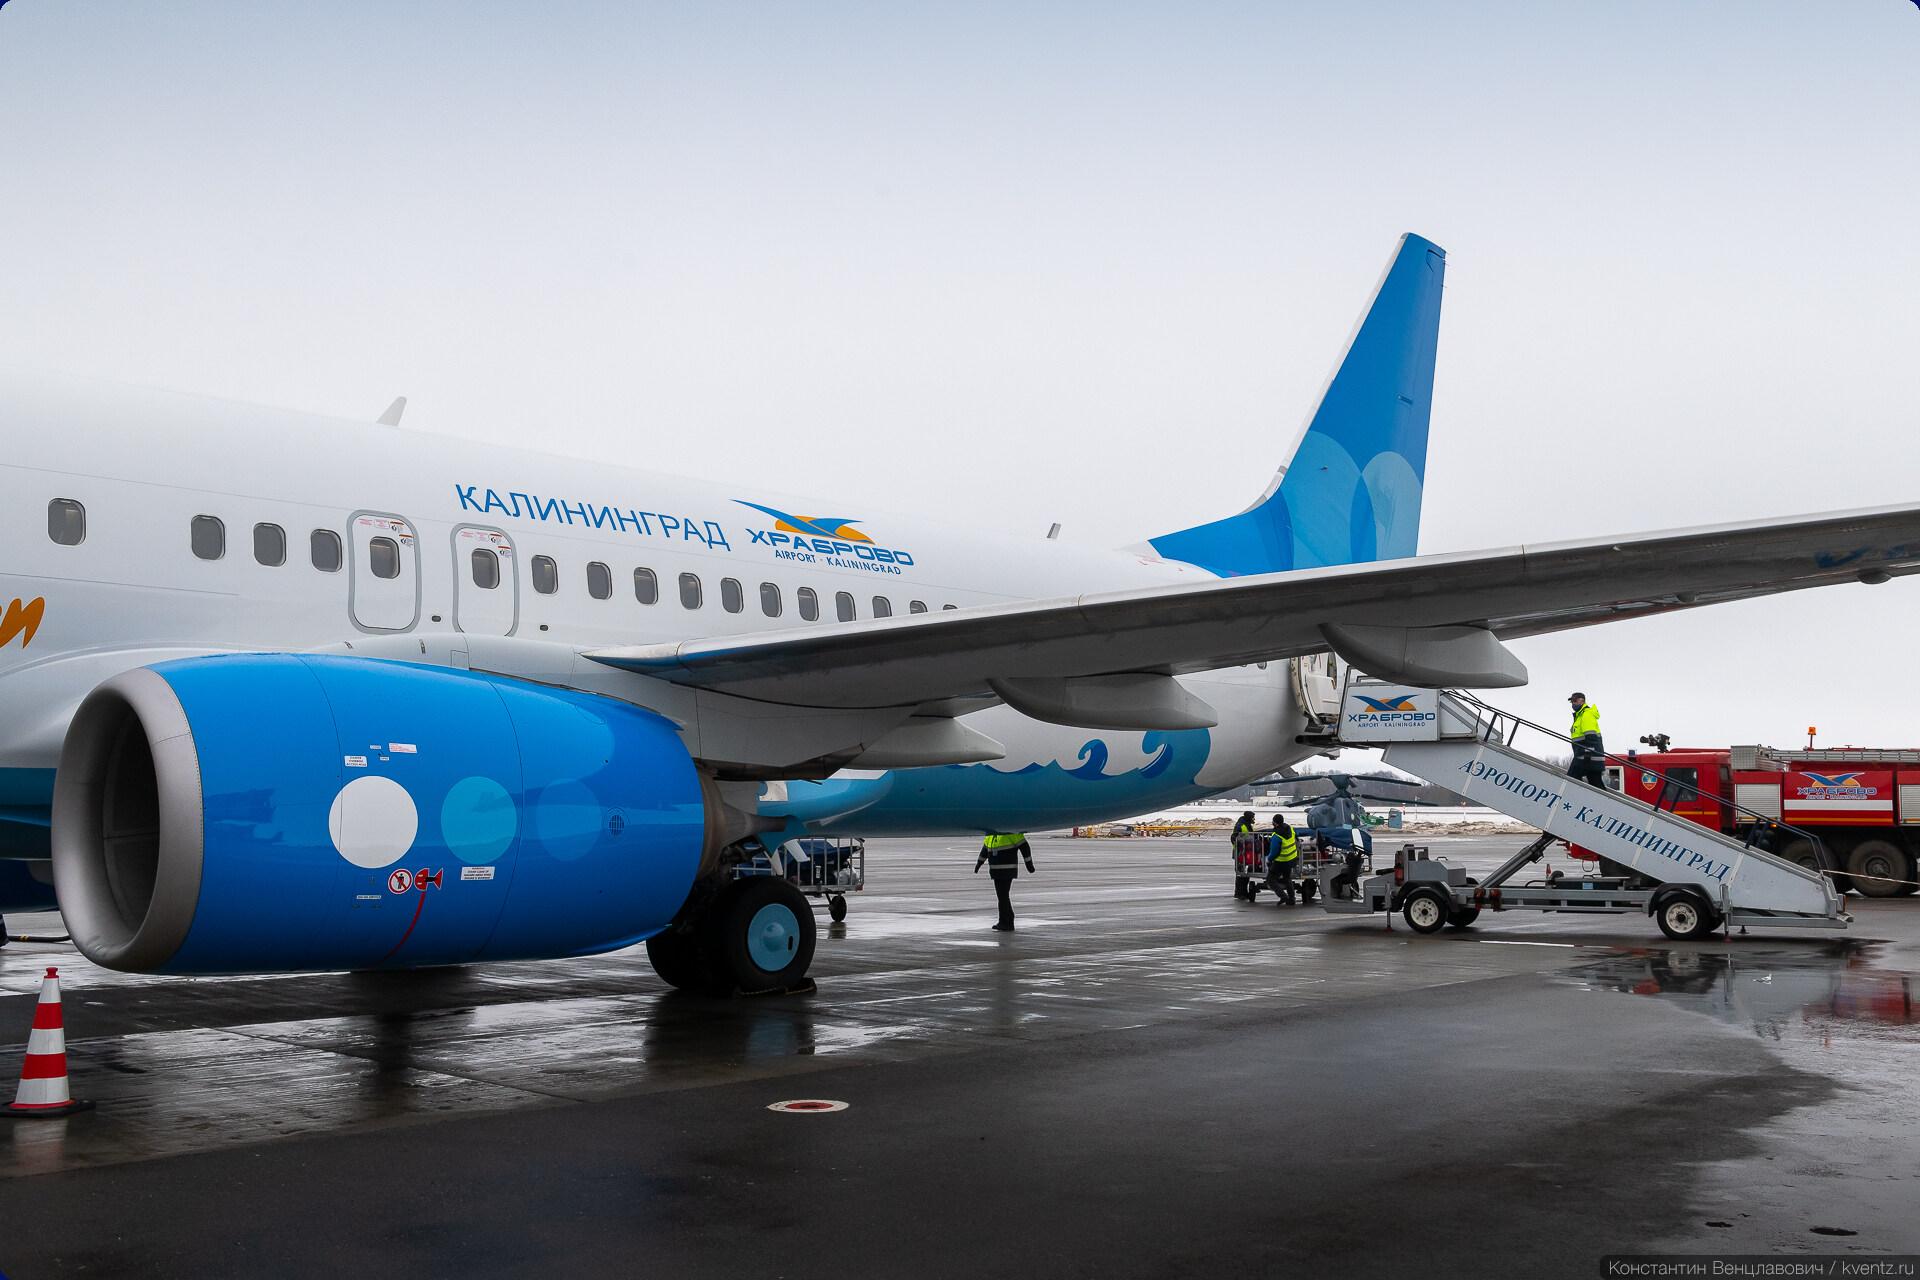 13. Непривычно видеть логотип аэропорта и на технике, и на борту самолёта.